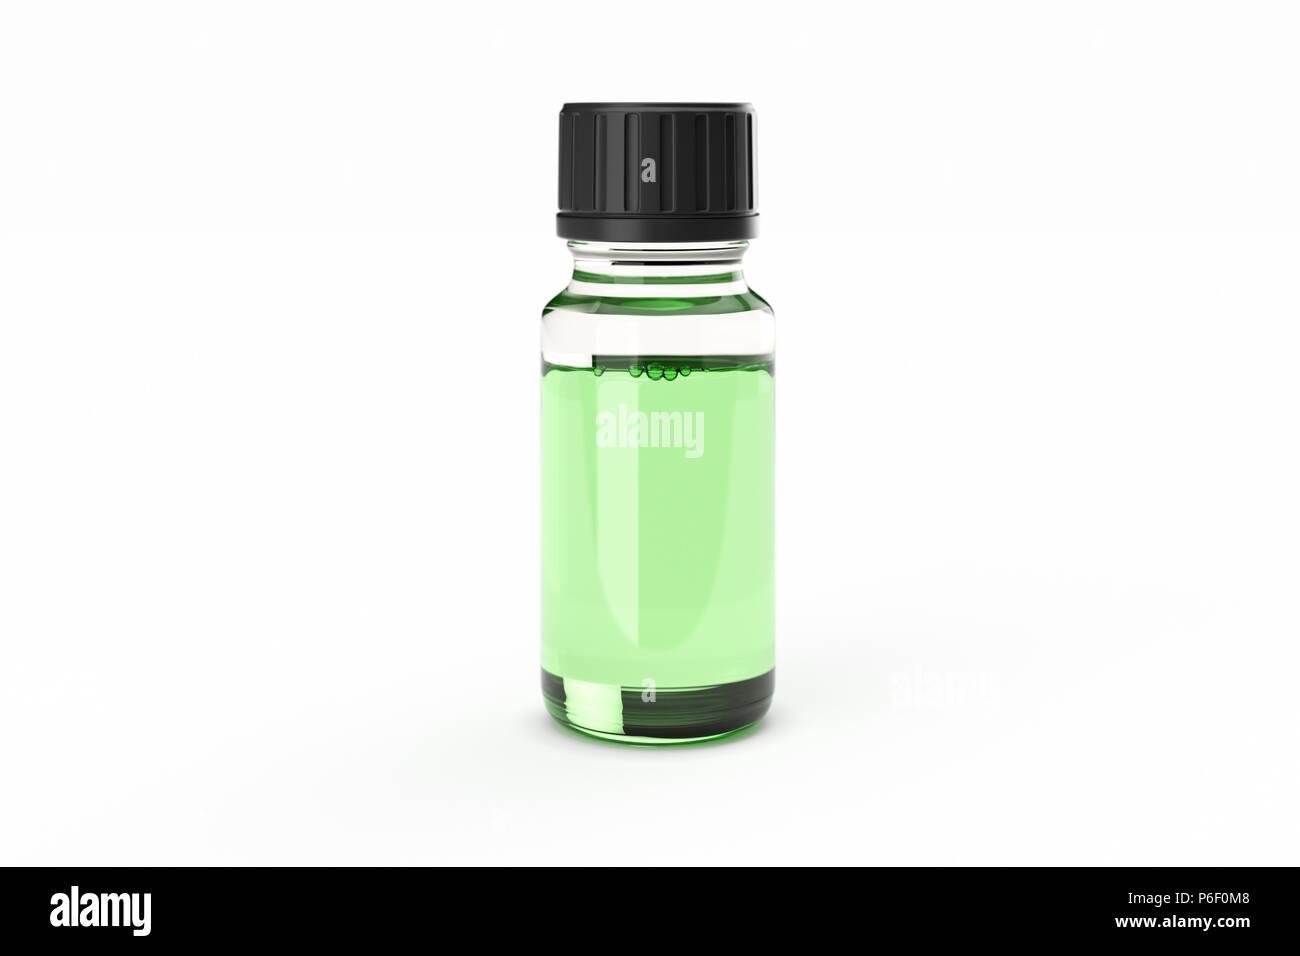 White medicine glass dropper bottle isolated - Stock Image